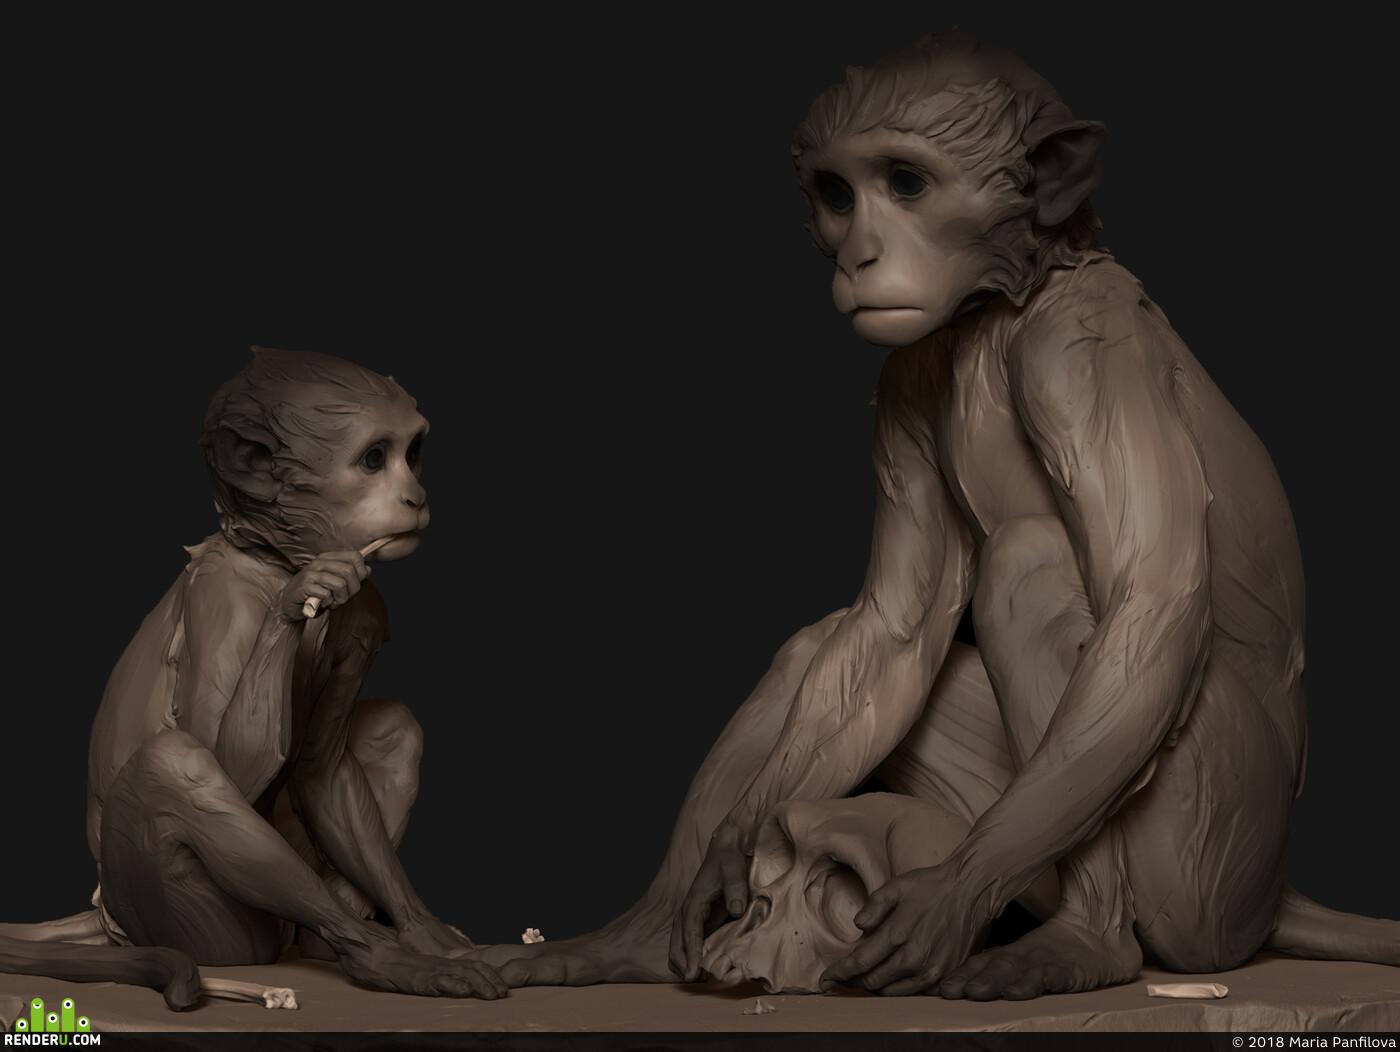 Обезьяна, Макака, Эмоции, скульптура, Животные